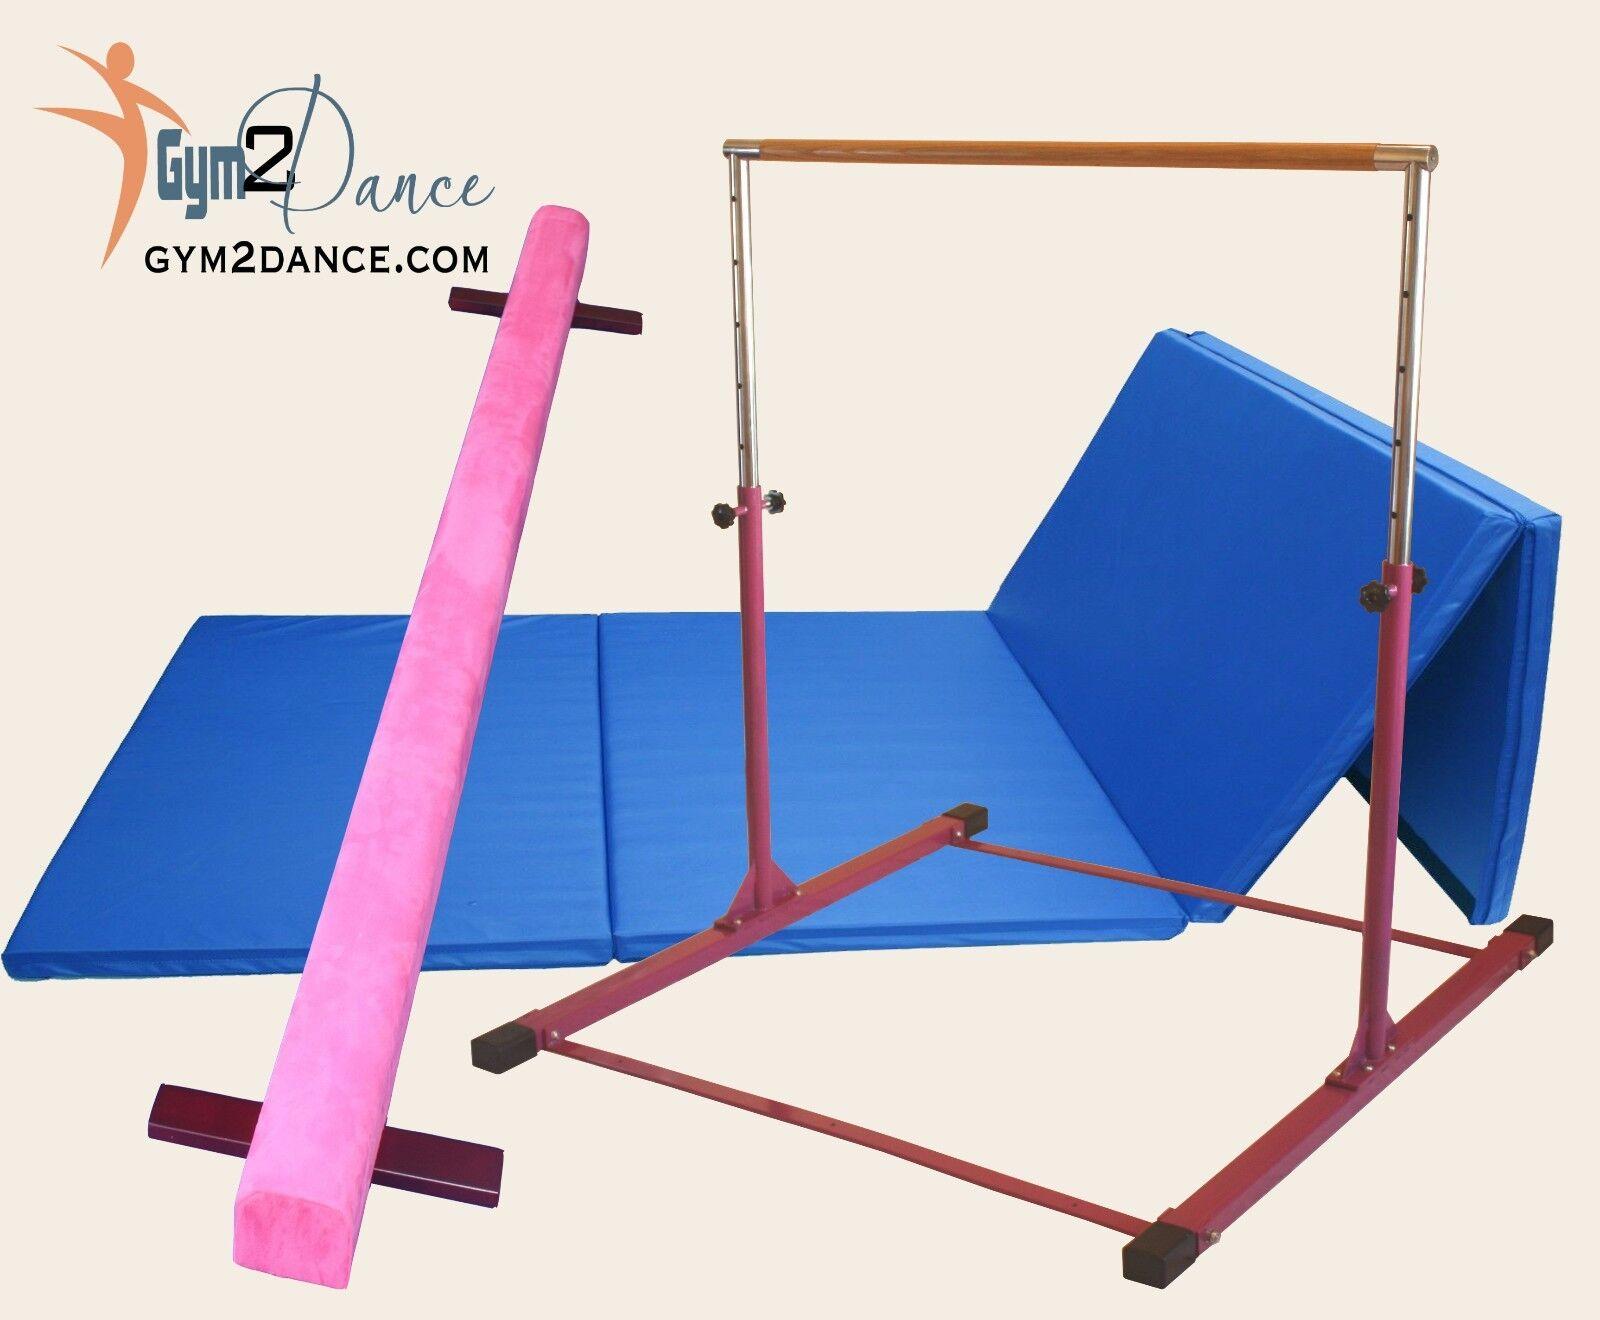 Combo Gymnastics Beam 8' +10' blueee Mat +Adjustable Gymnastics  bar by Gym 2 Dance  online retailers